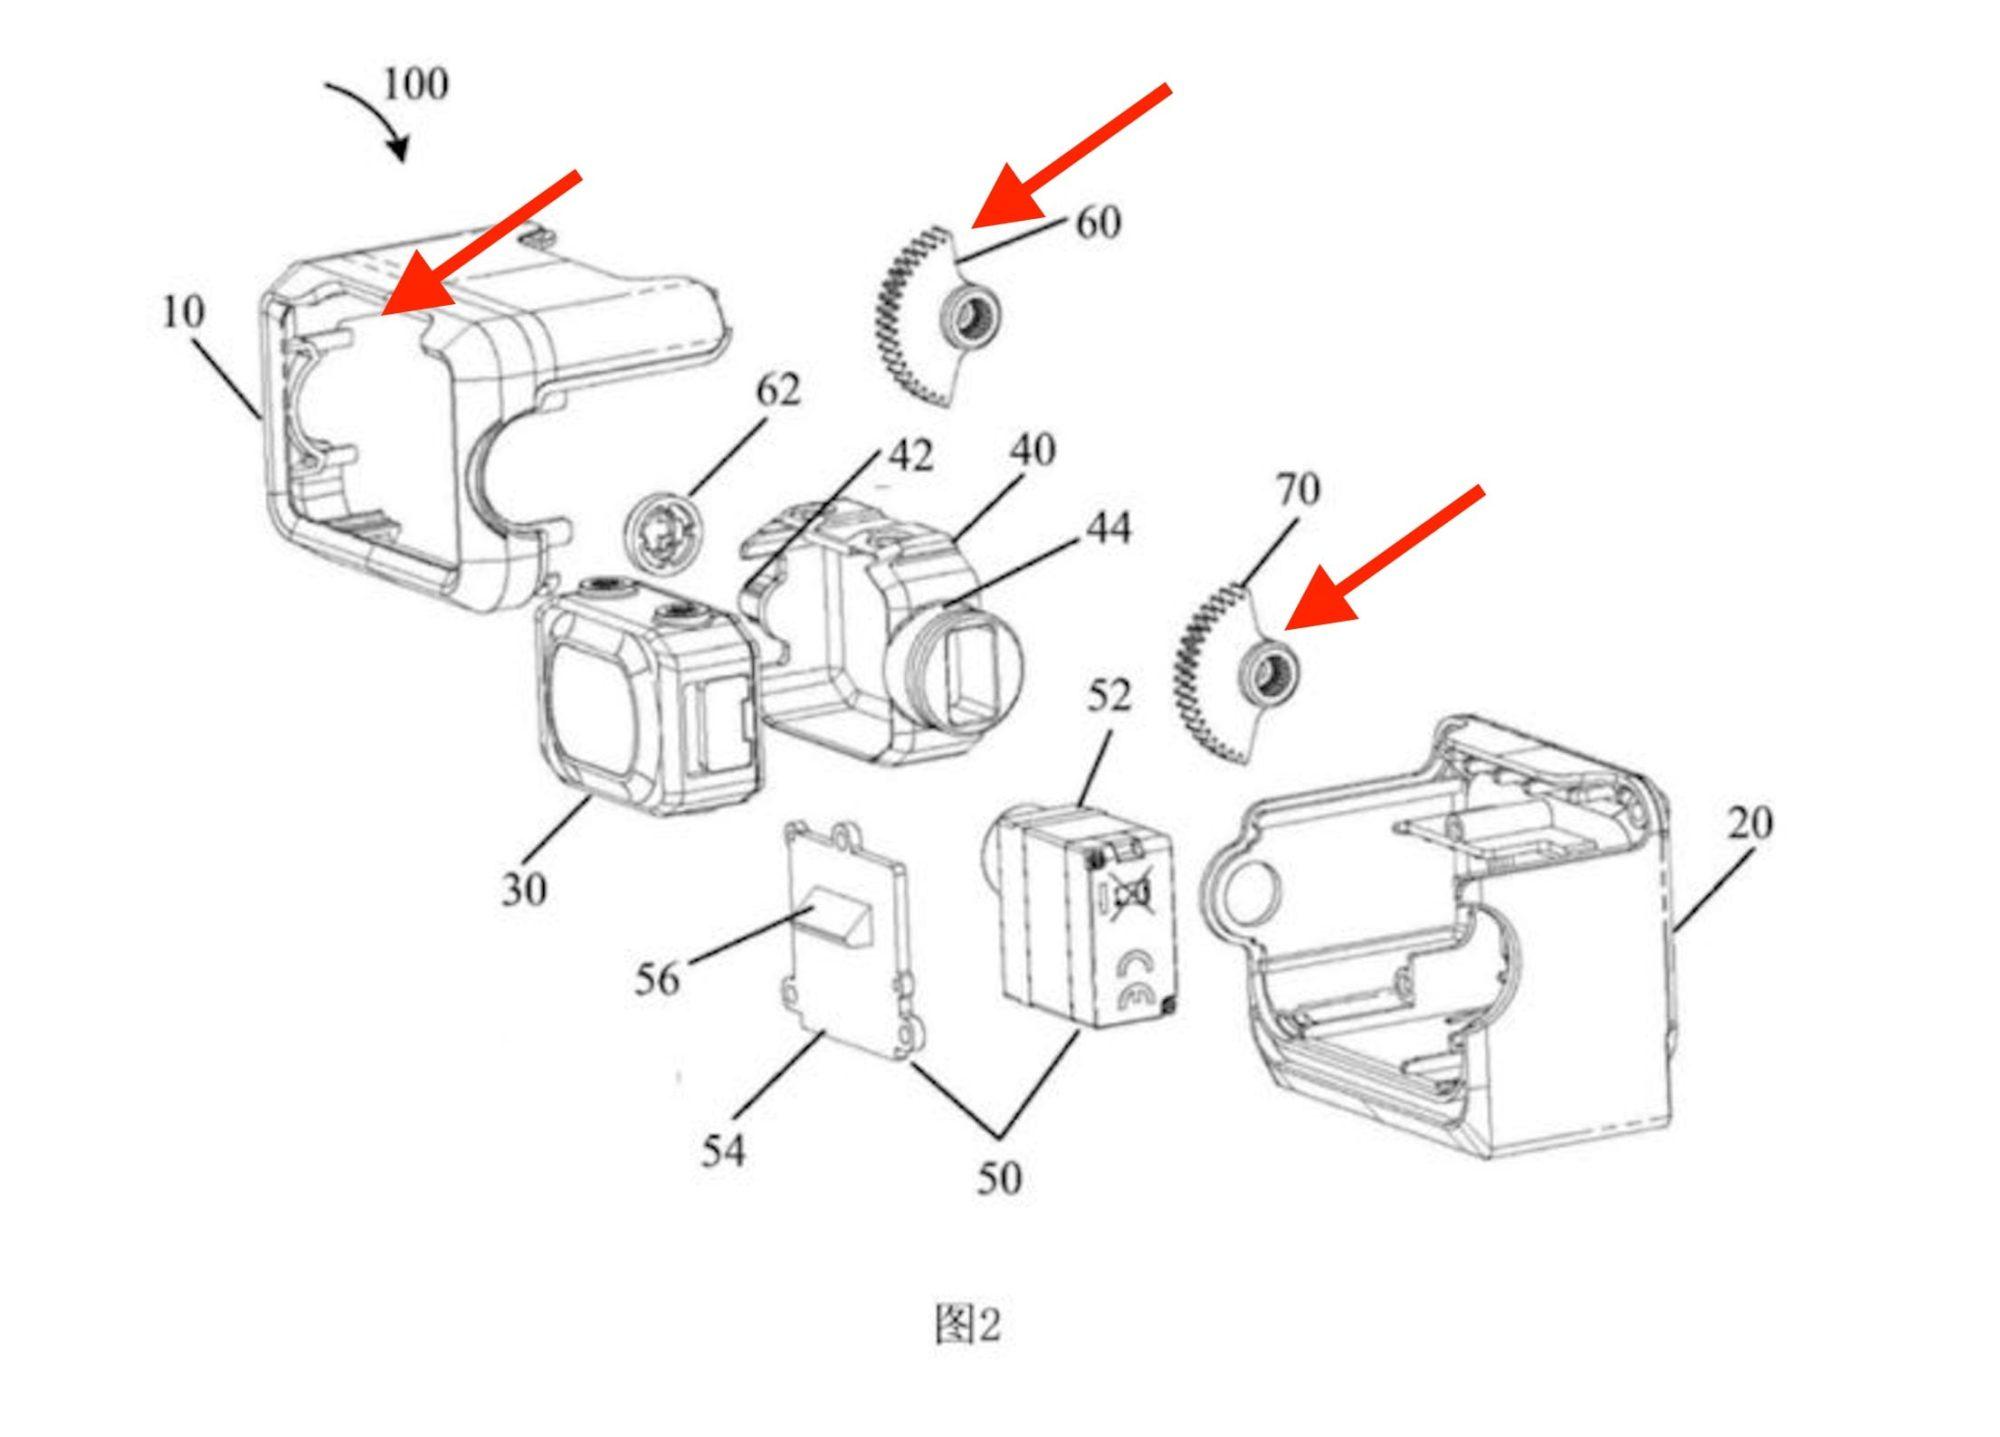 DJI FPV camera shows up in patent. Will DJI finally release an FPV drone?